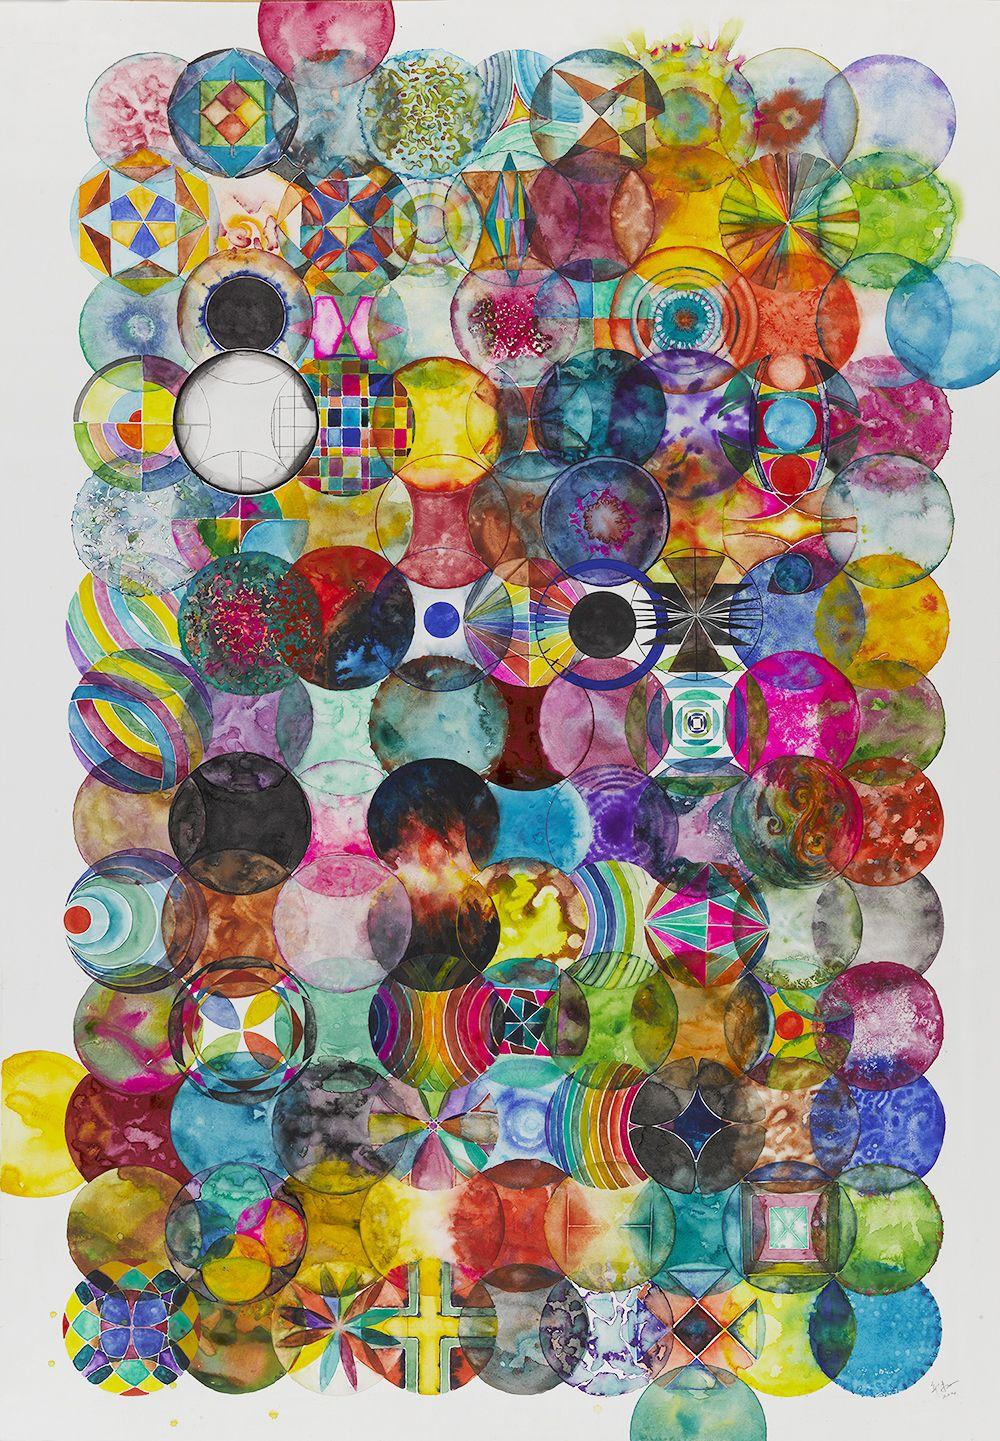 121 Color Balls121个彩色圆球